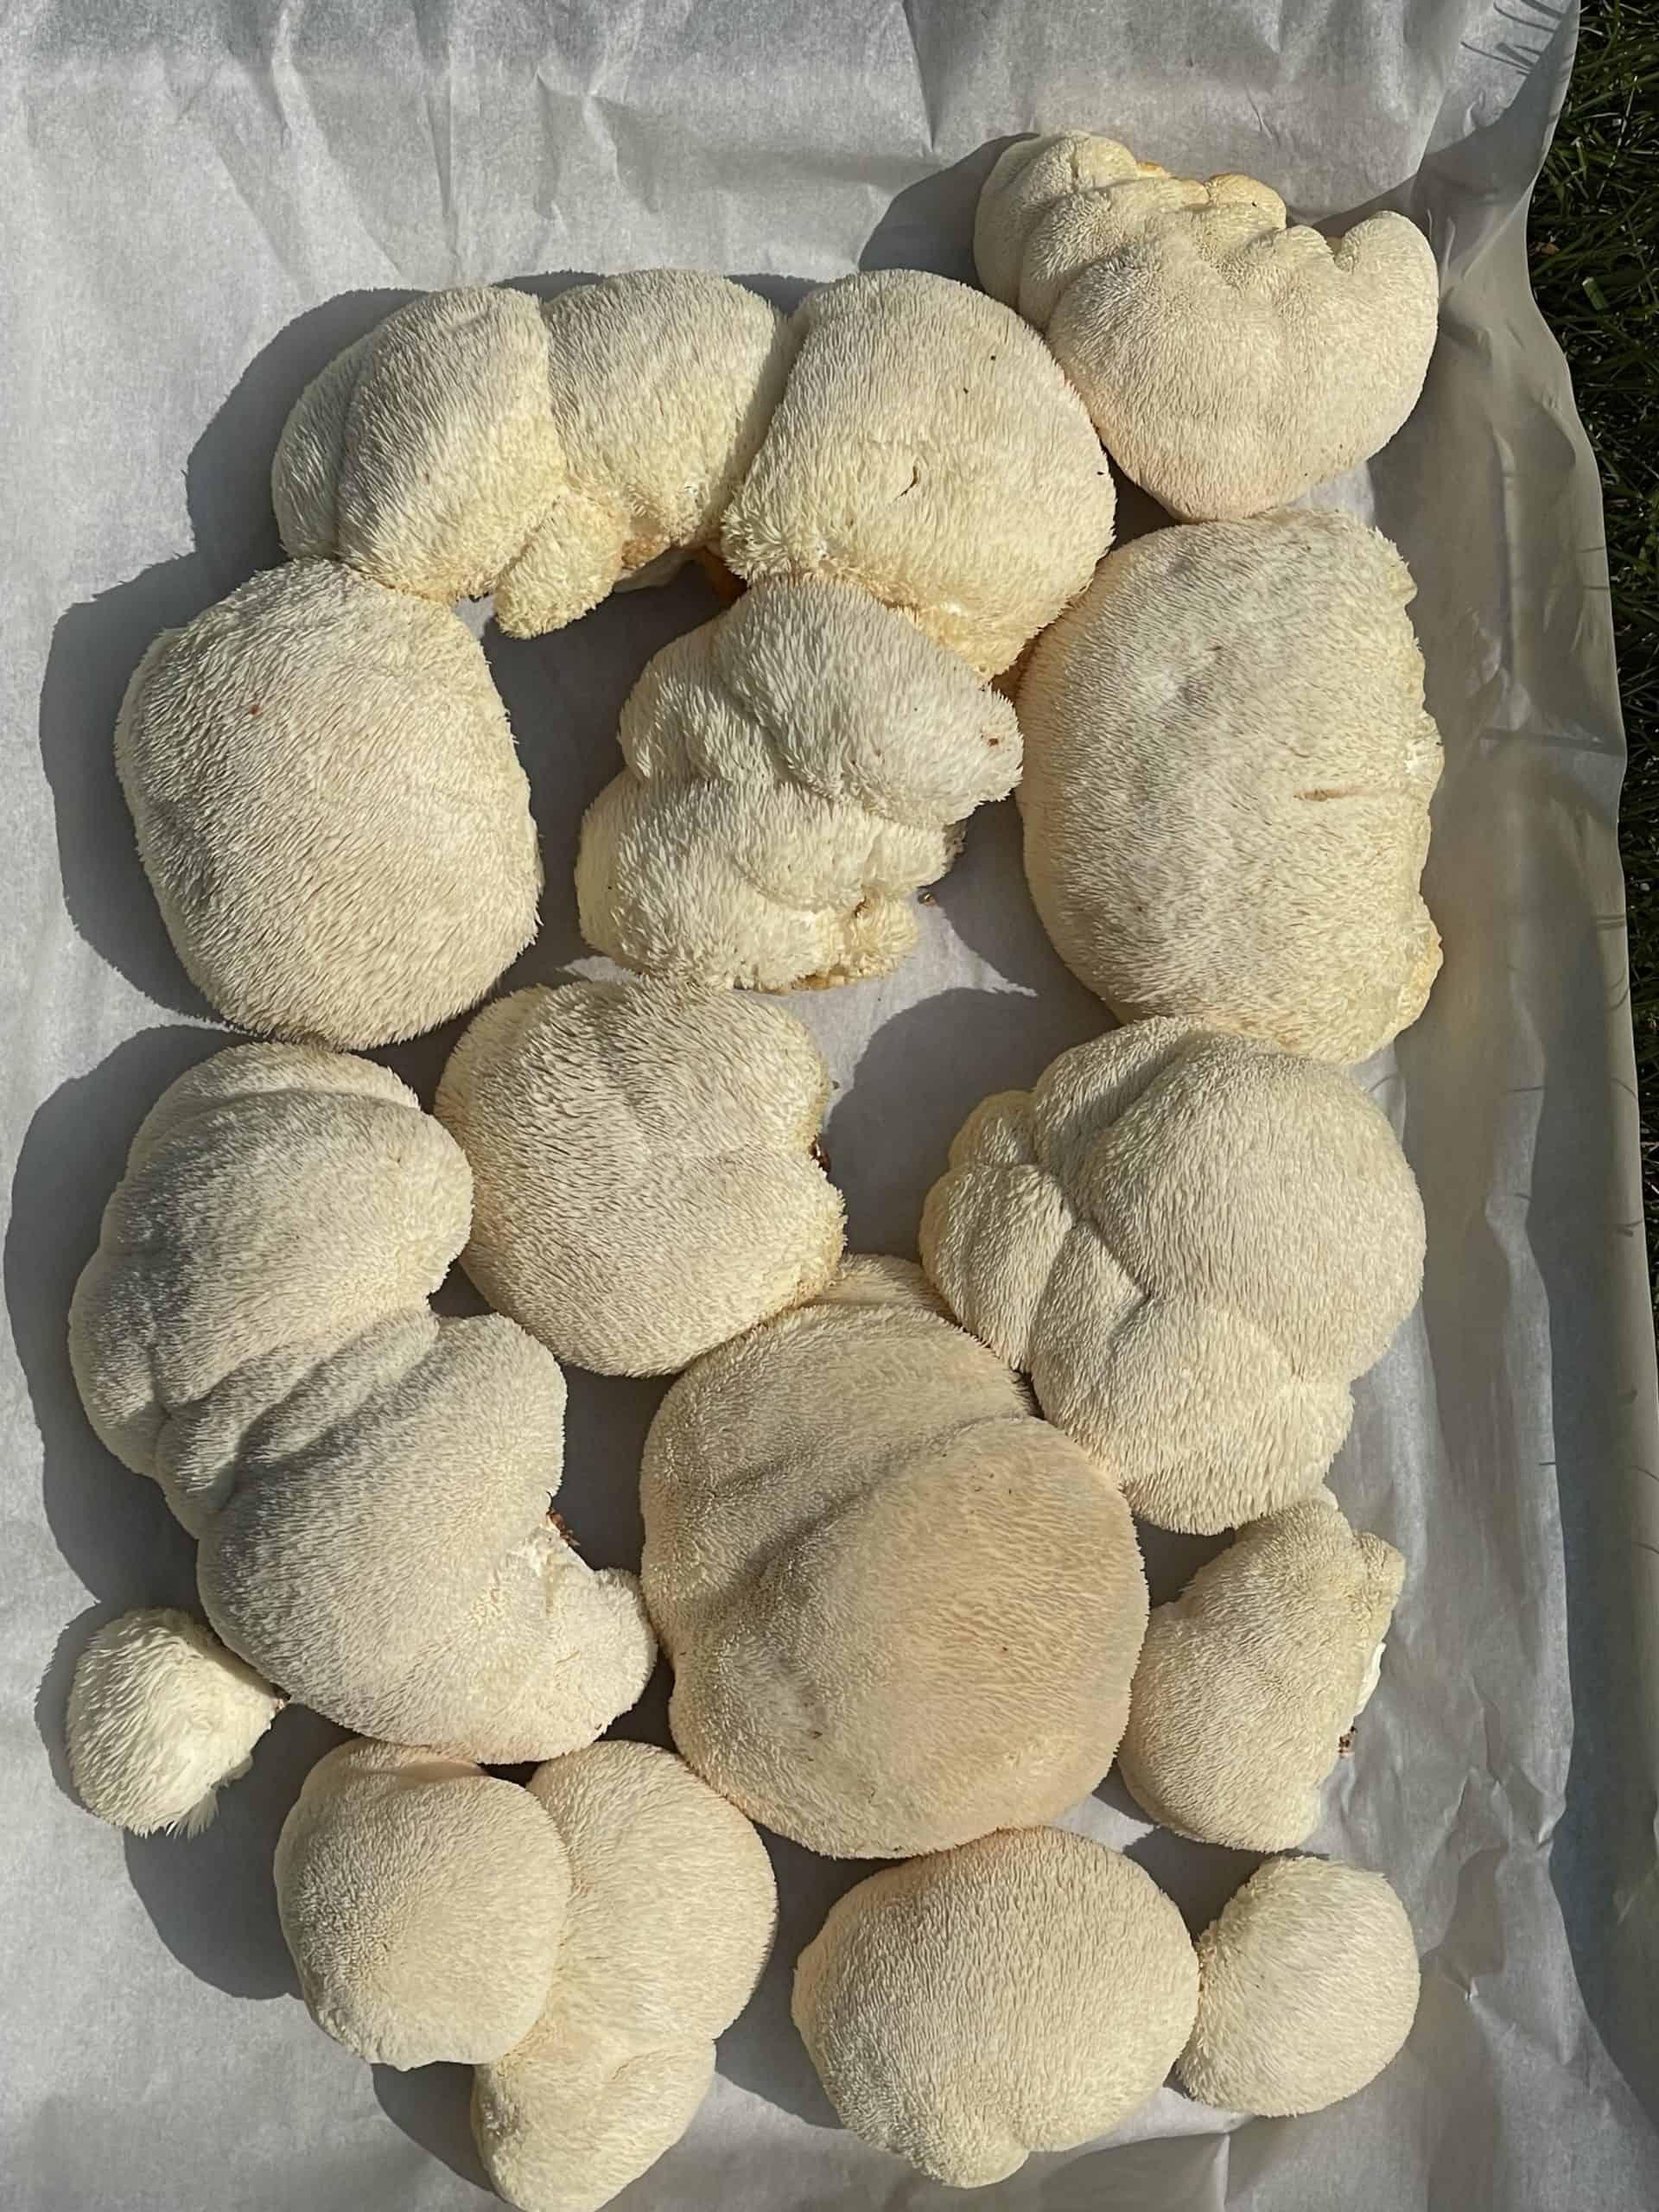 Harvested Lion's Mane Mushrooms